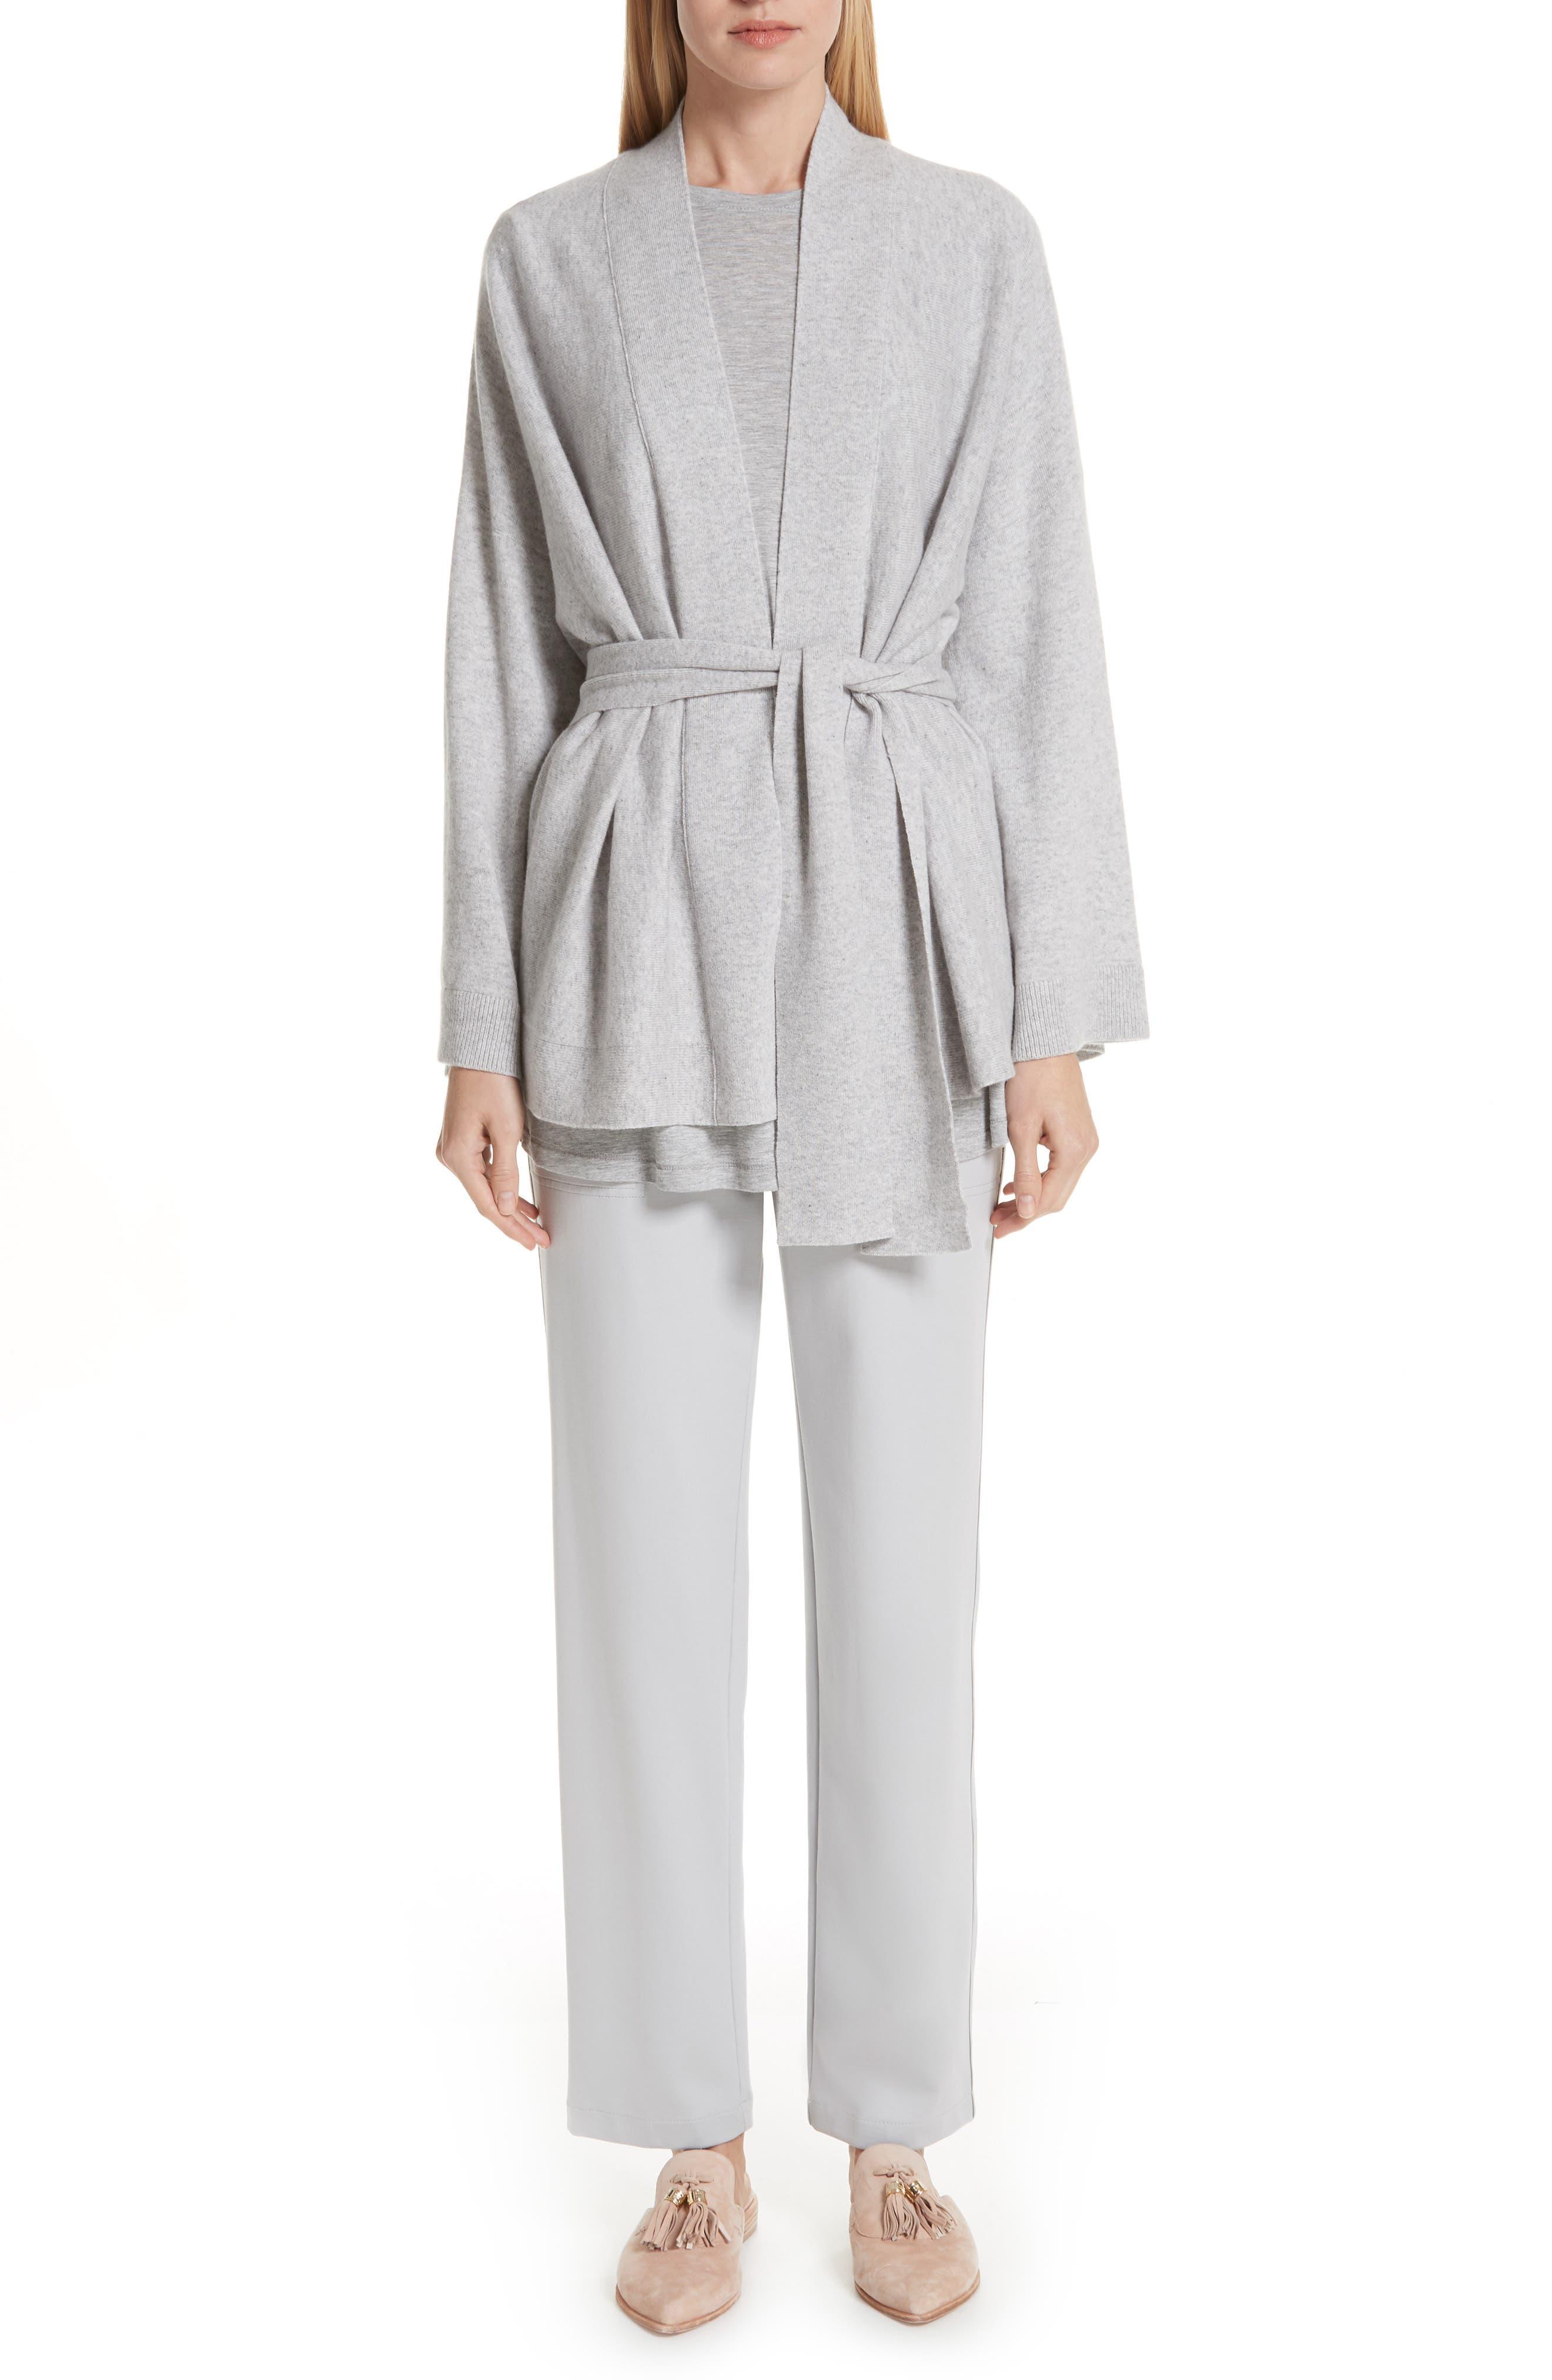 Cashmere Kimono Cardigan,                             Main thumbnail 1, color,                             GREY HEATHER